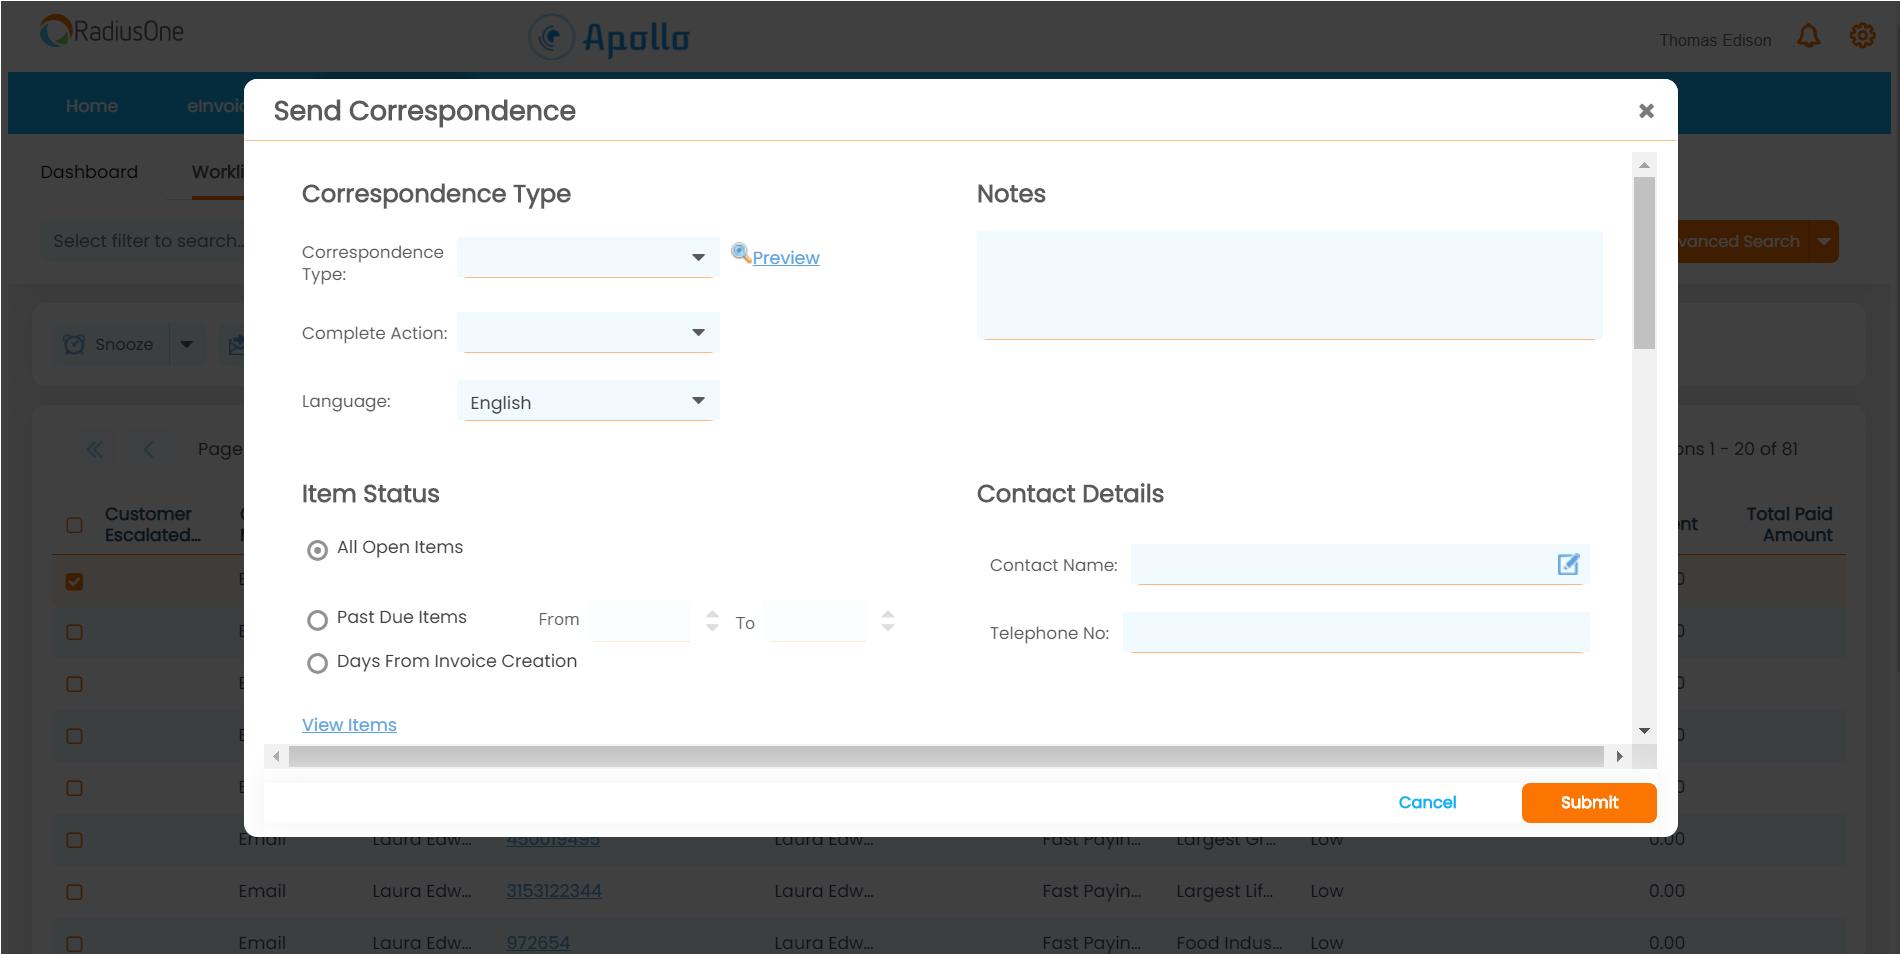 easy-to-create correspondence templates